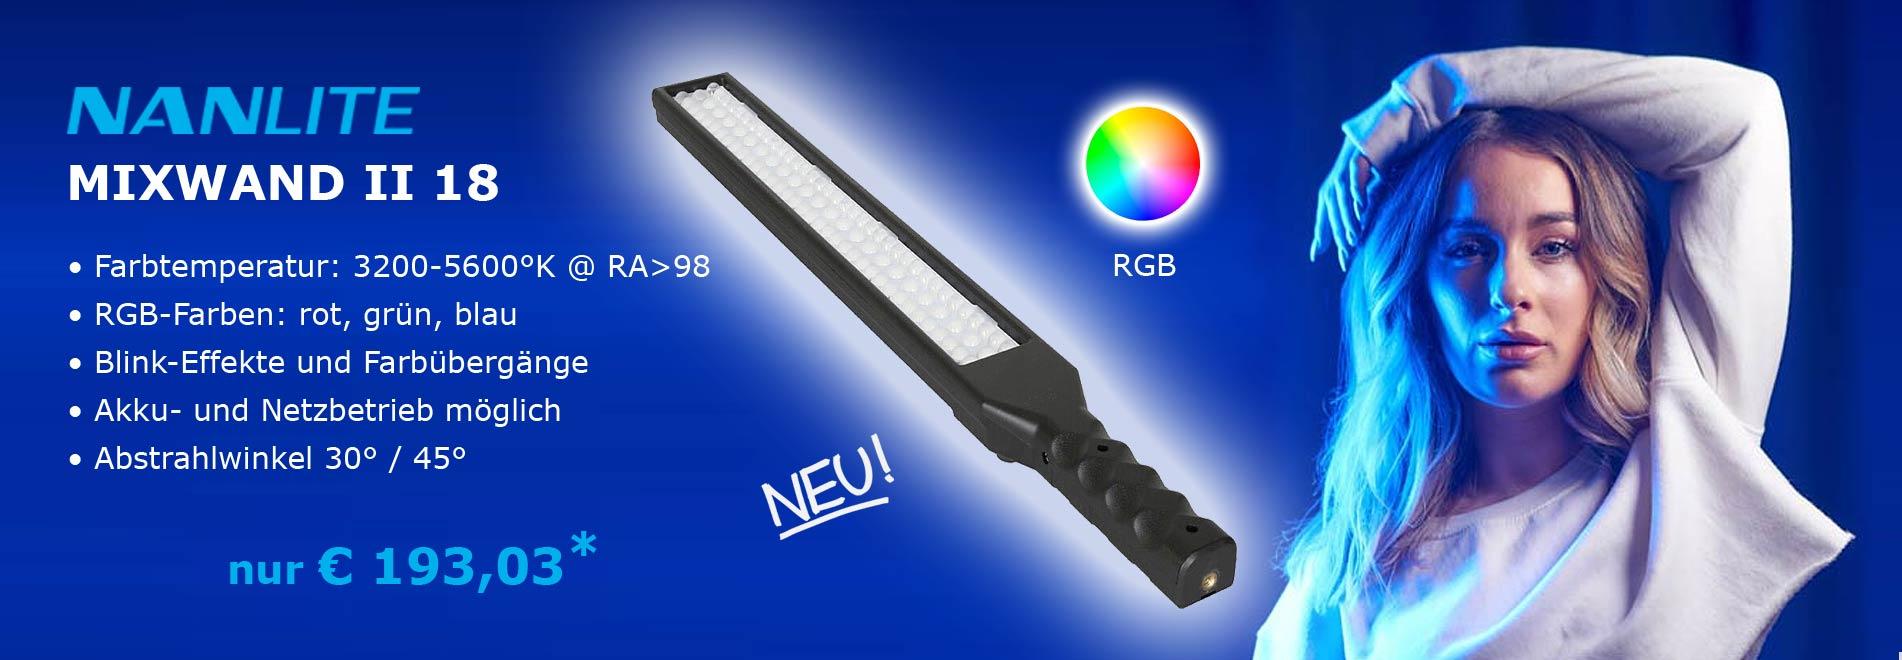 RGB Studioleuchte NANLITE MIXWAND II 18